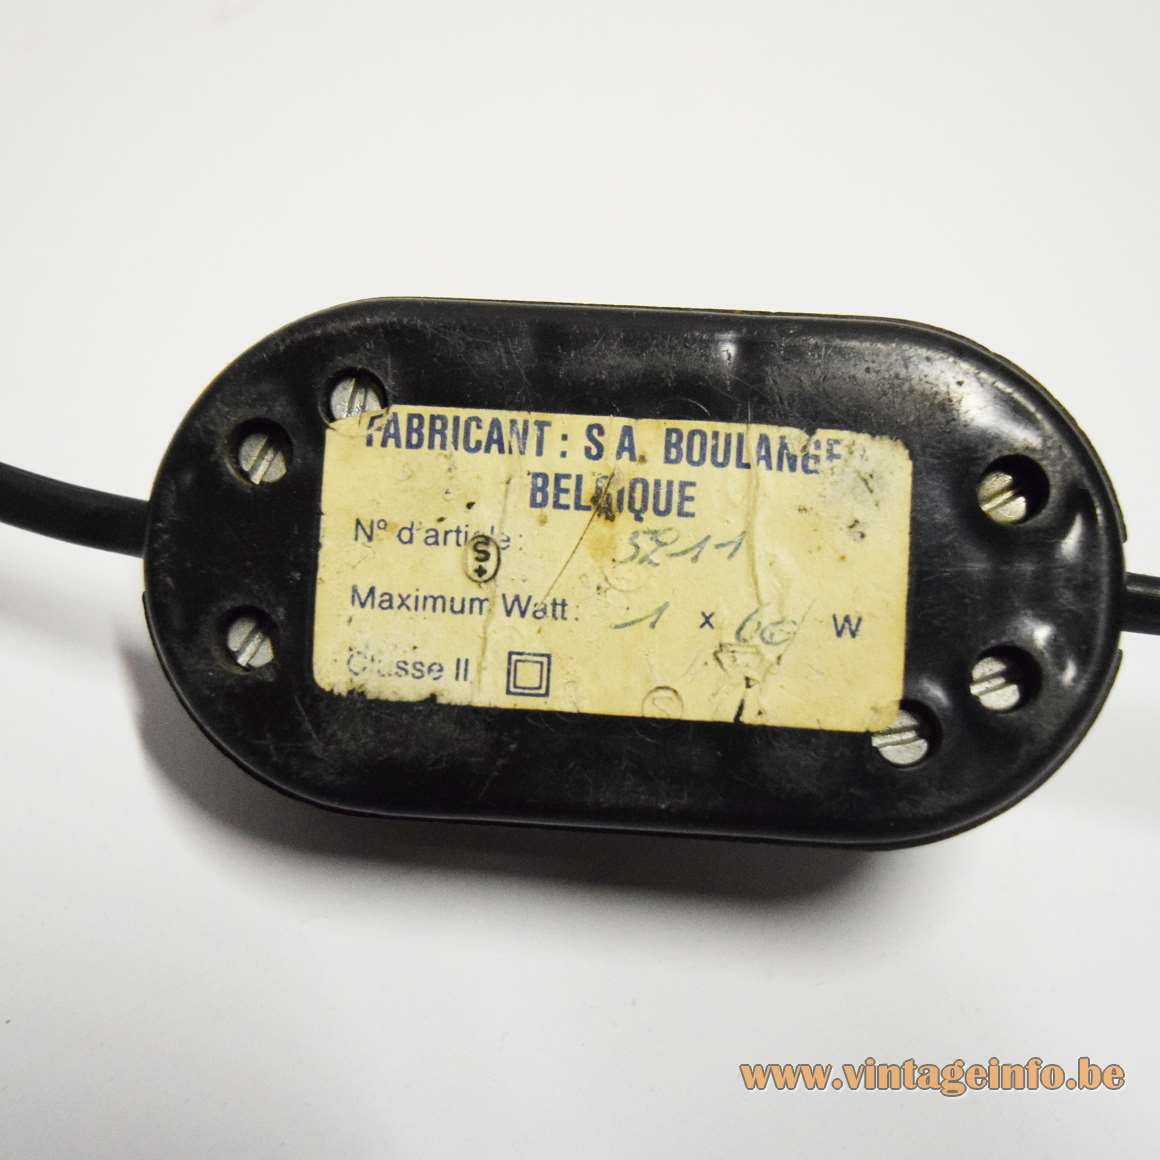 S.A. Boulanger black reading floor lamp - VLM Components D-661 switch - S.A. Boulanger label